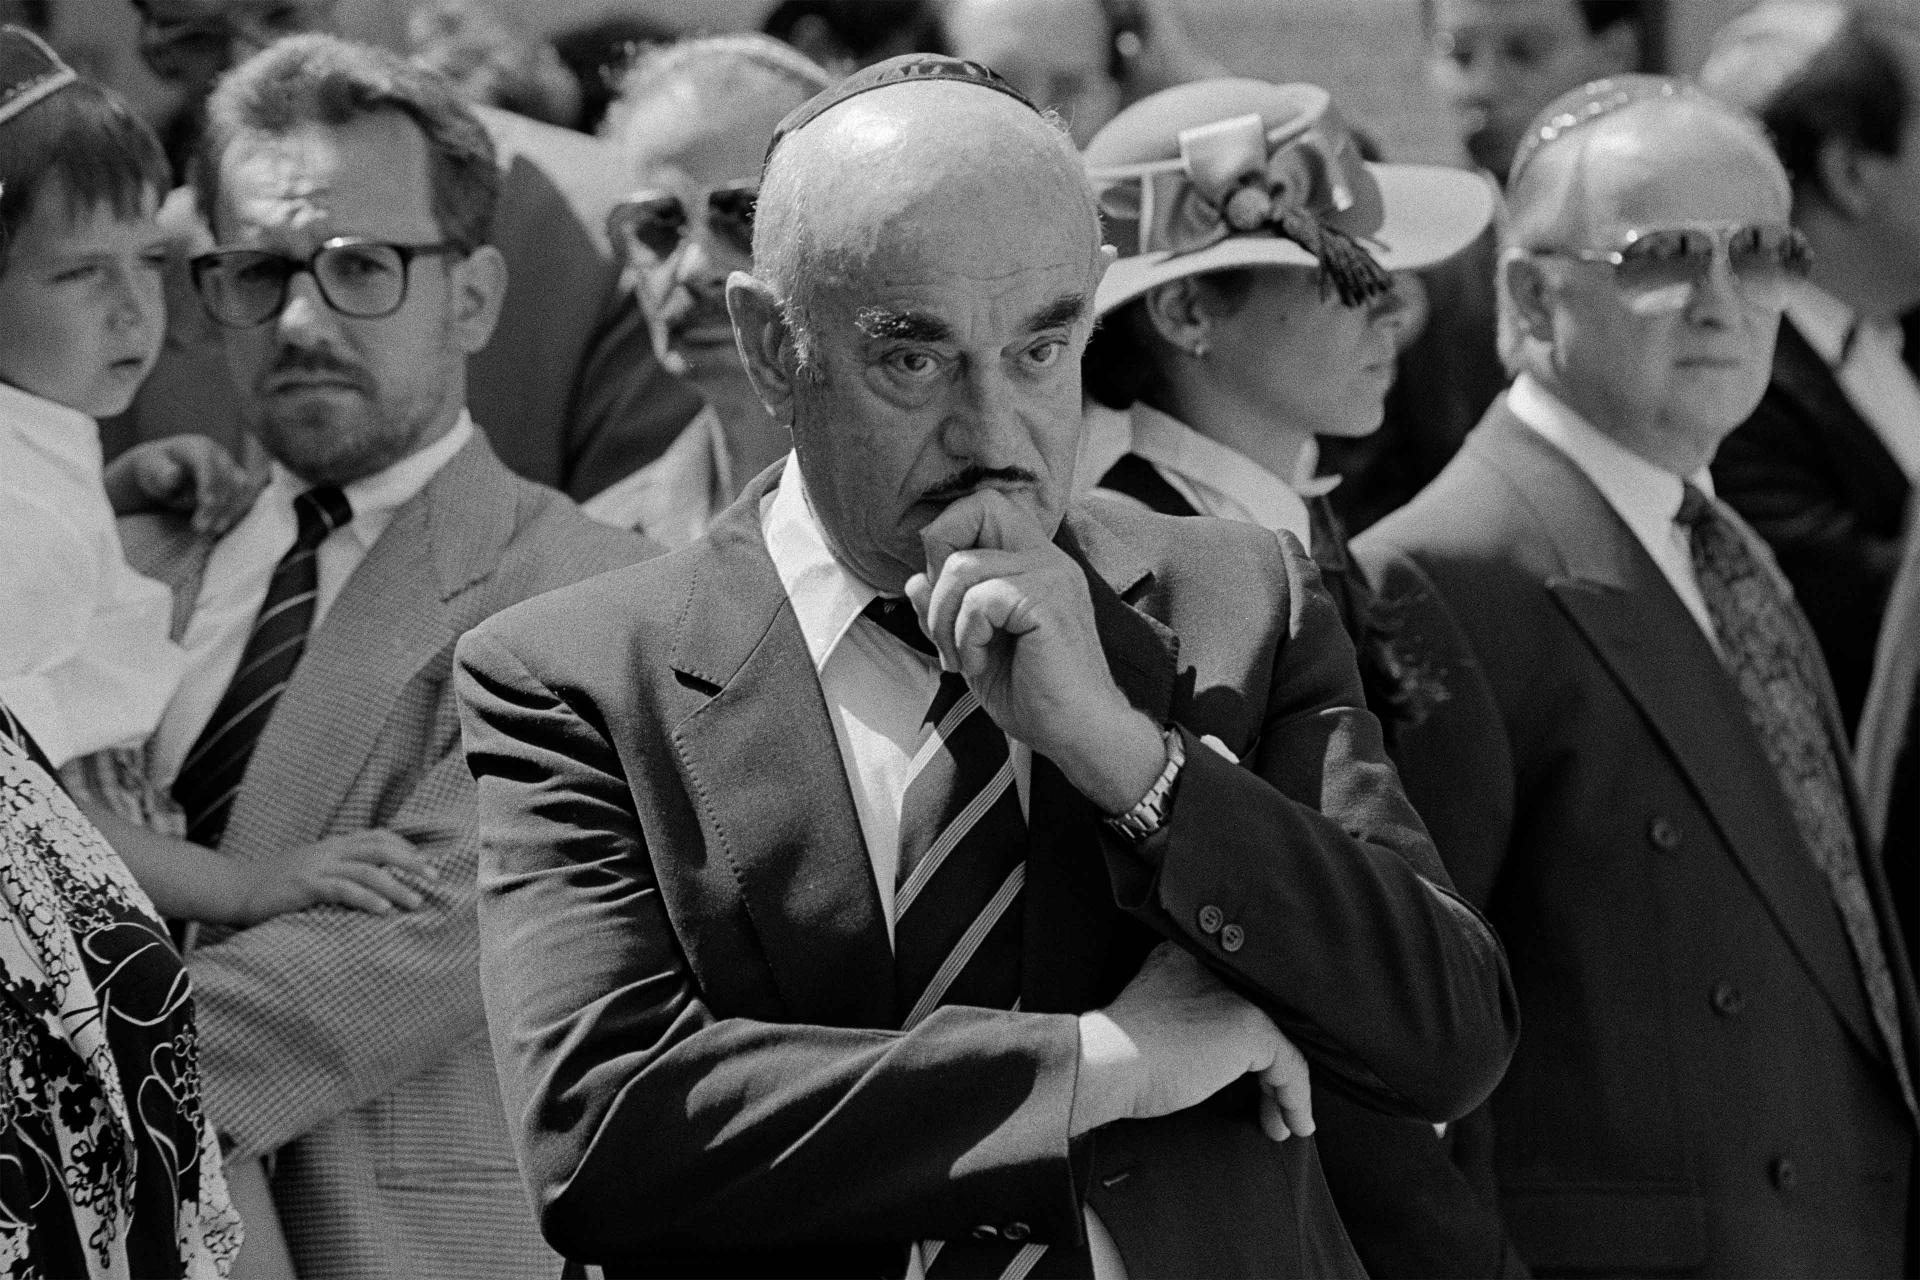 Black and white photo of Artur Brauner